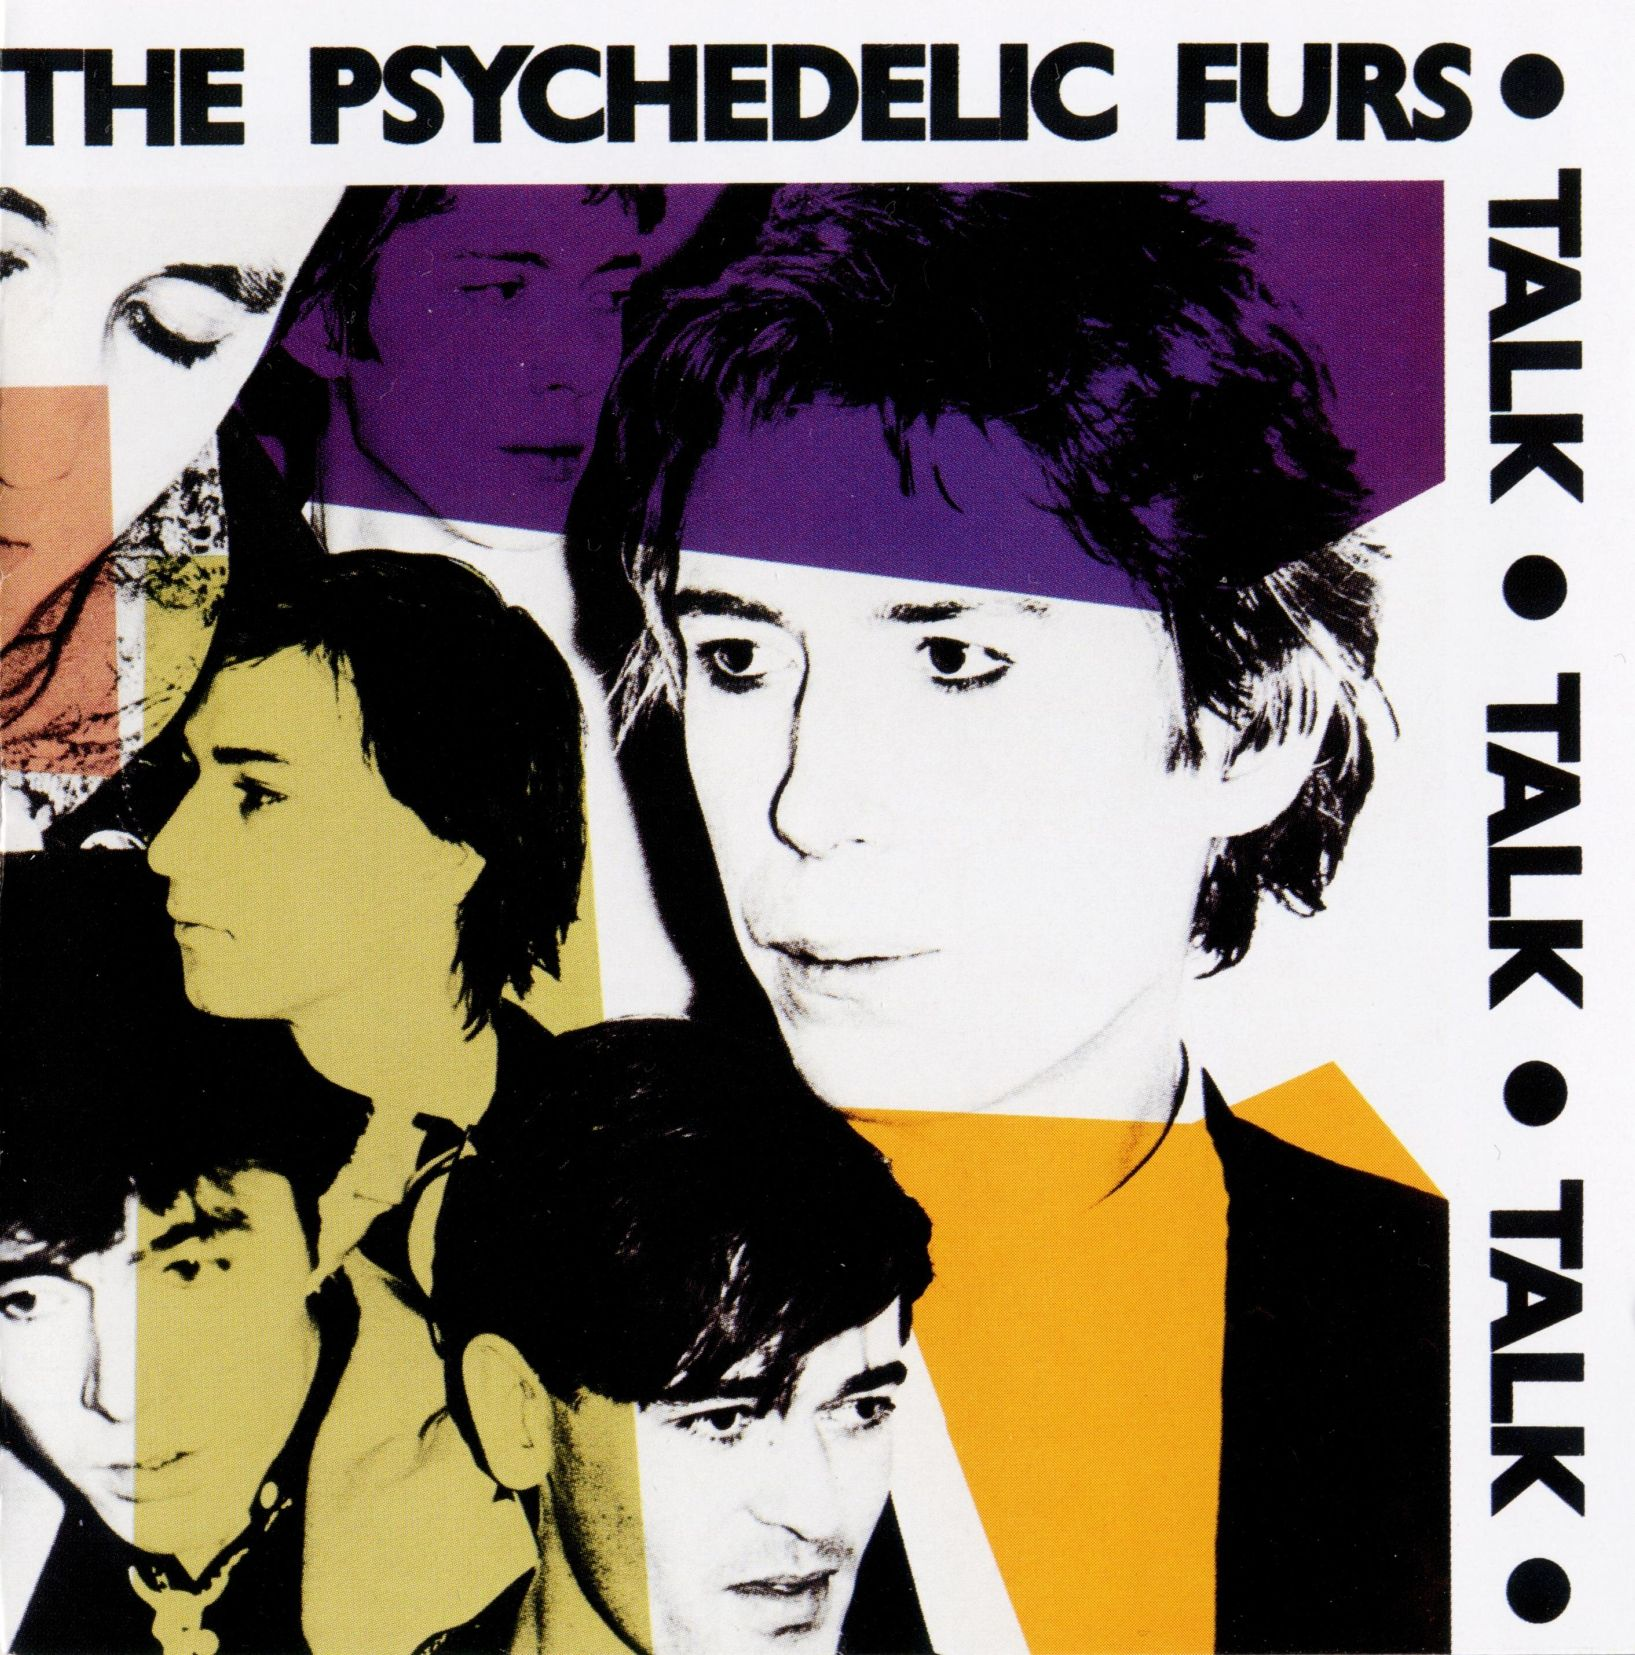 Psychedelic Furs Talk Talk Talk Album Covers The